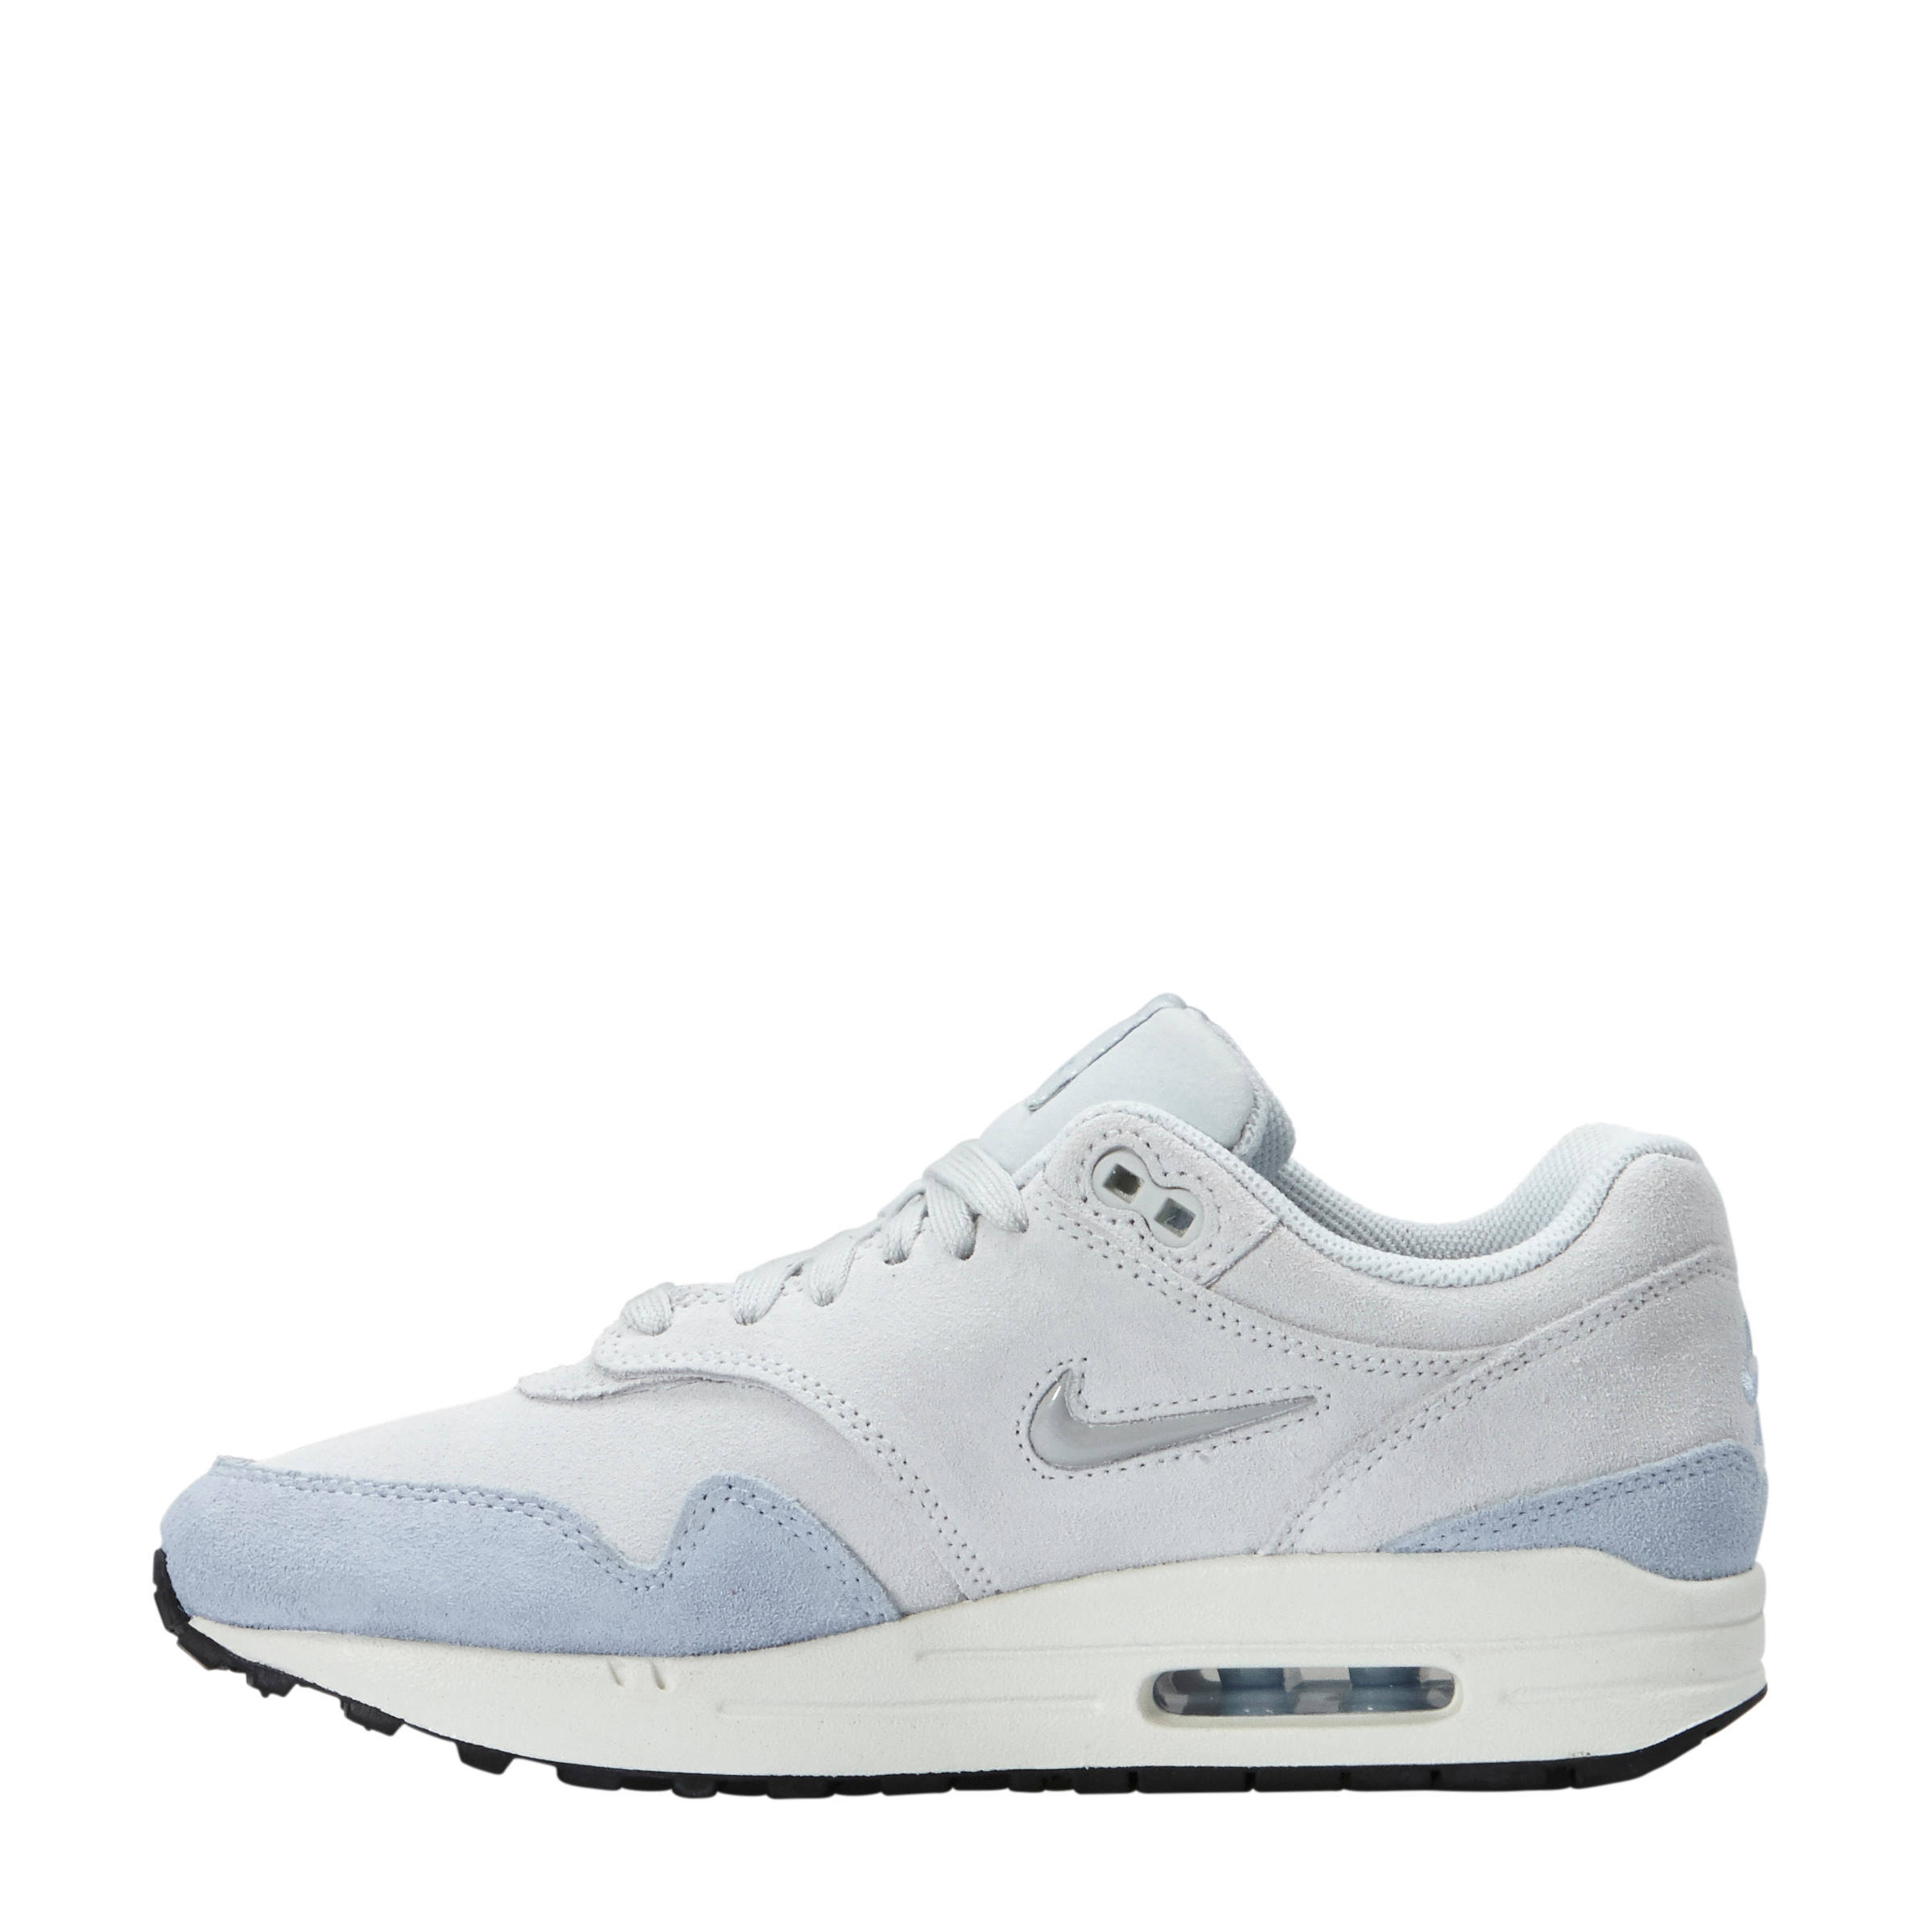 premium selection 7f4db 45caf nike-air-max -1-premium-sneakers-gebroken-wit-lichtblauw-ecru-0887223877998.jpg